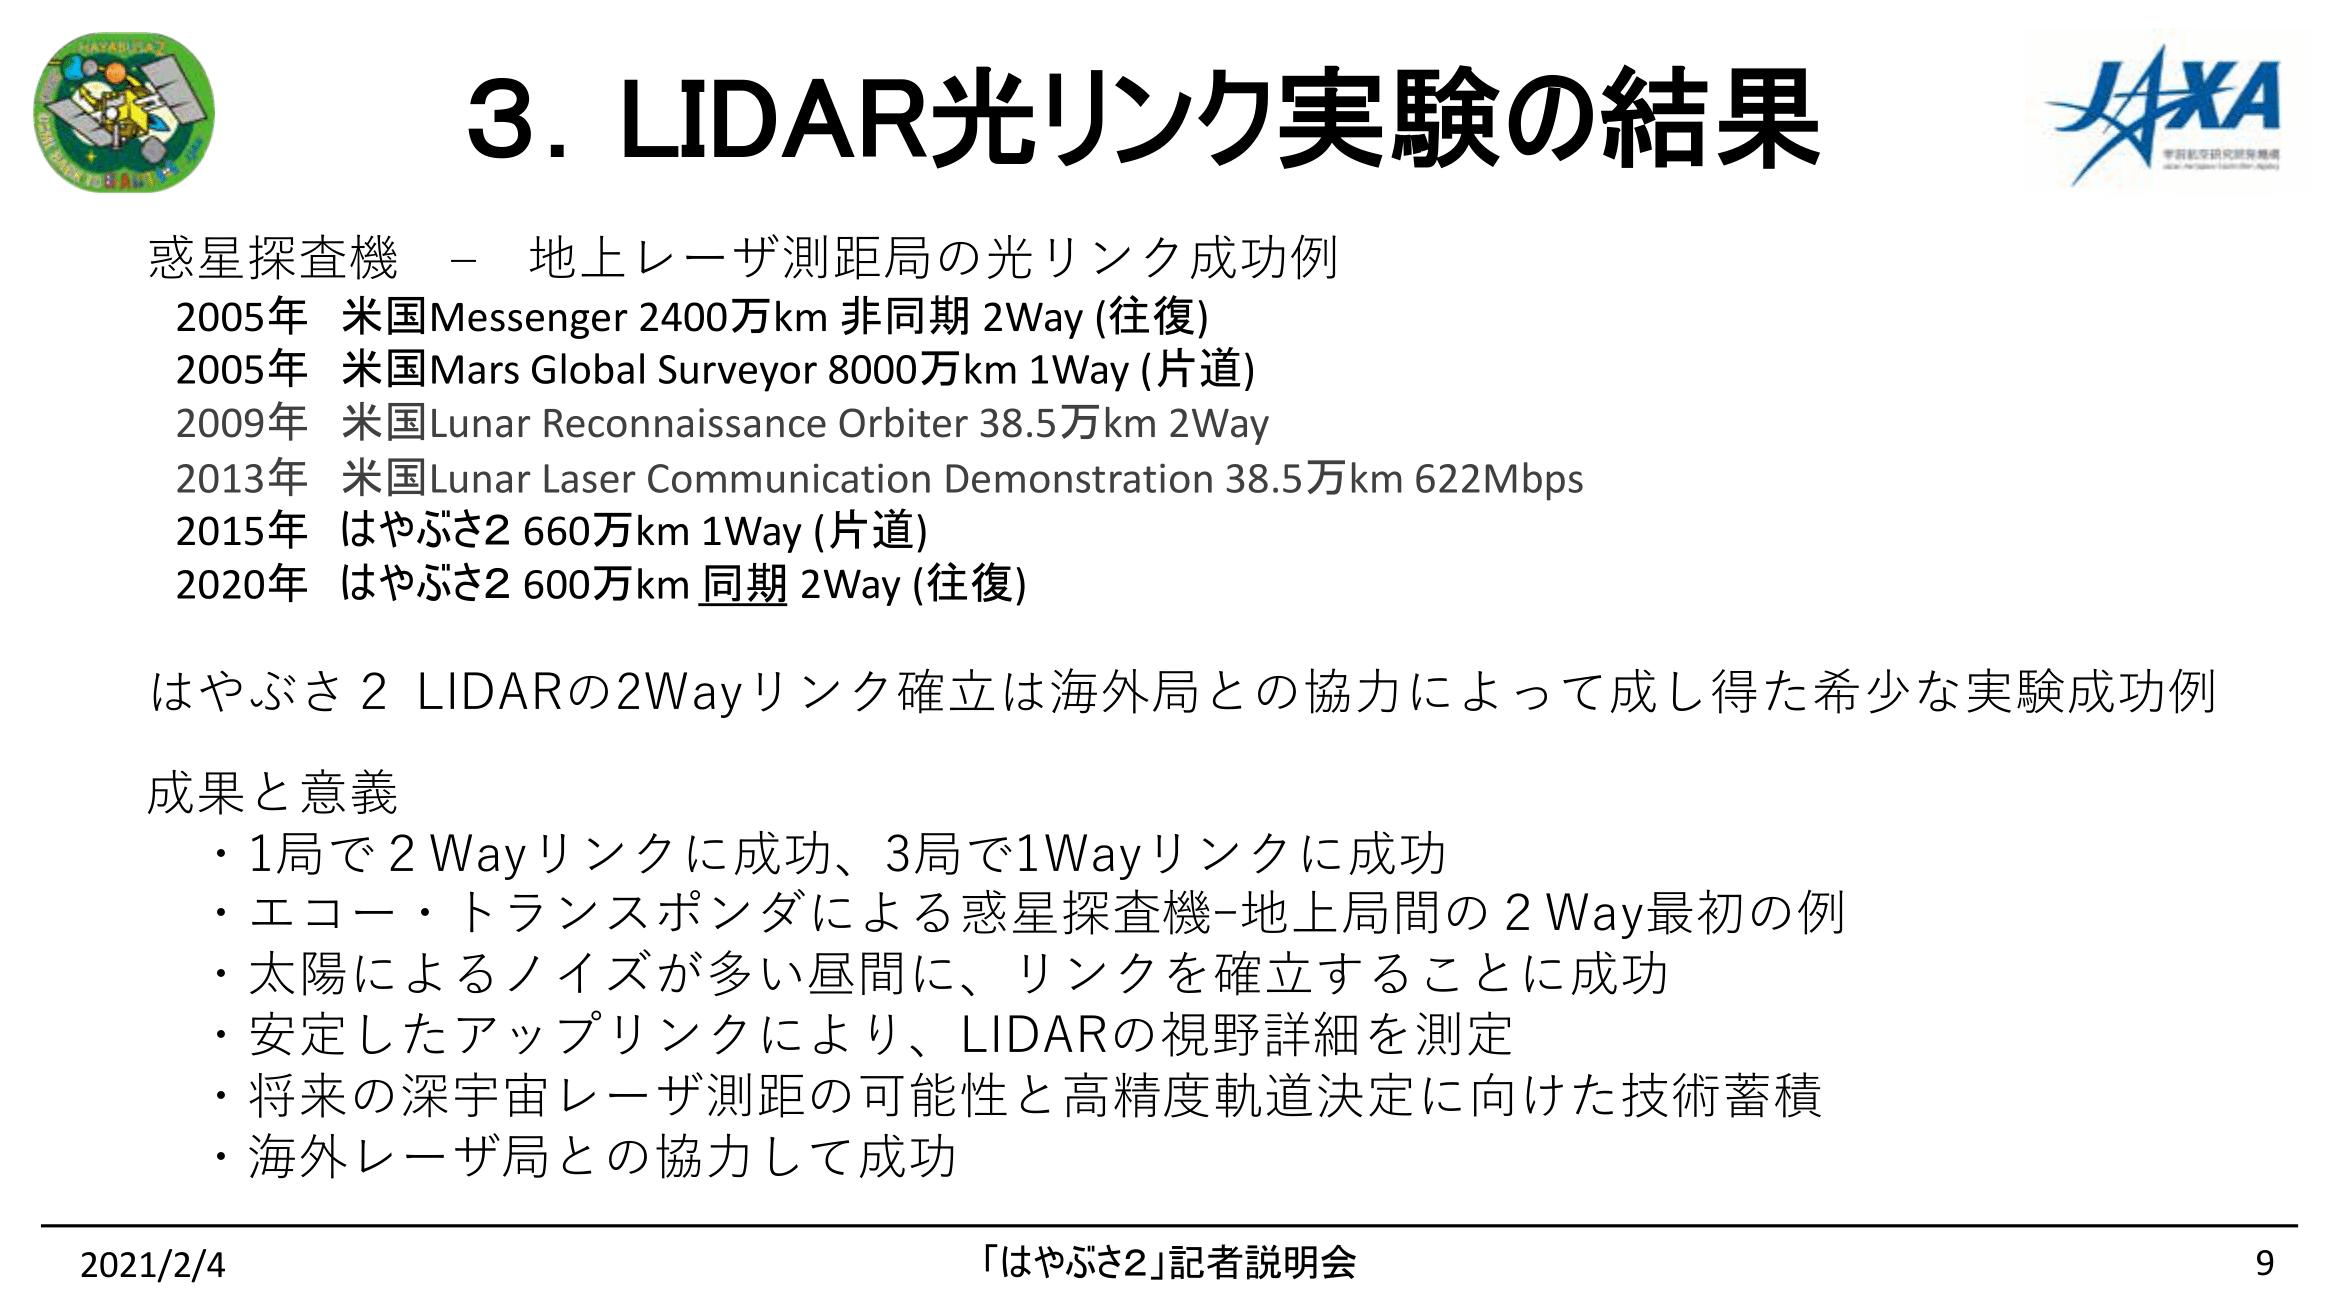 f:id:Imamura:20210204134245p:plain